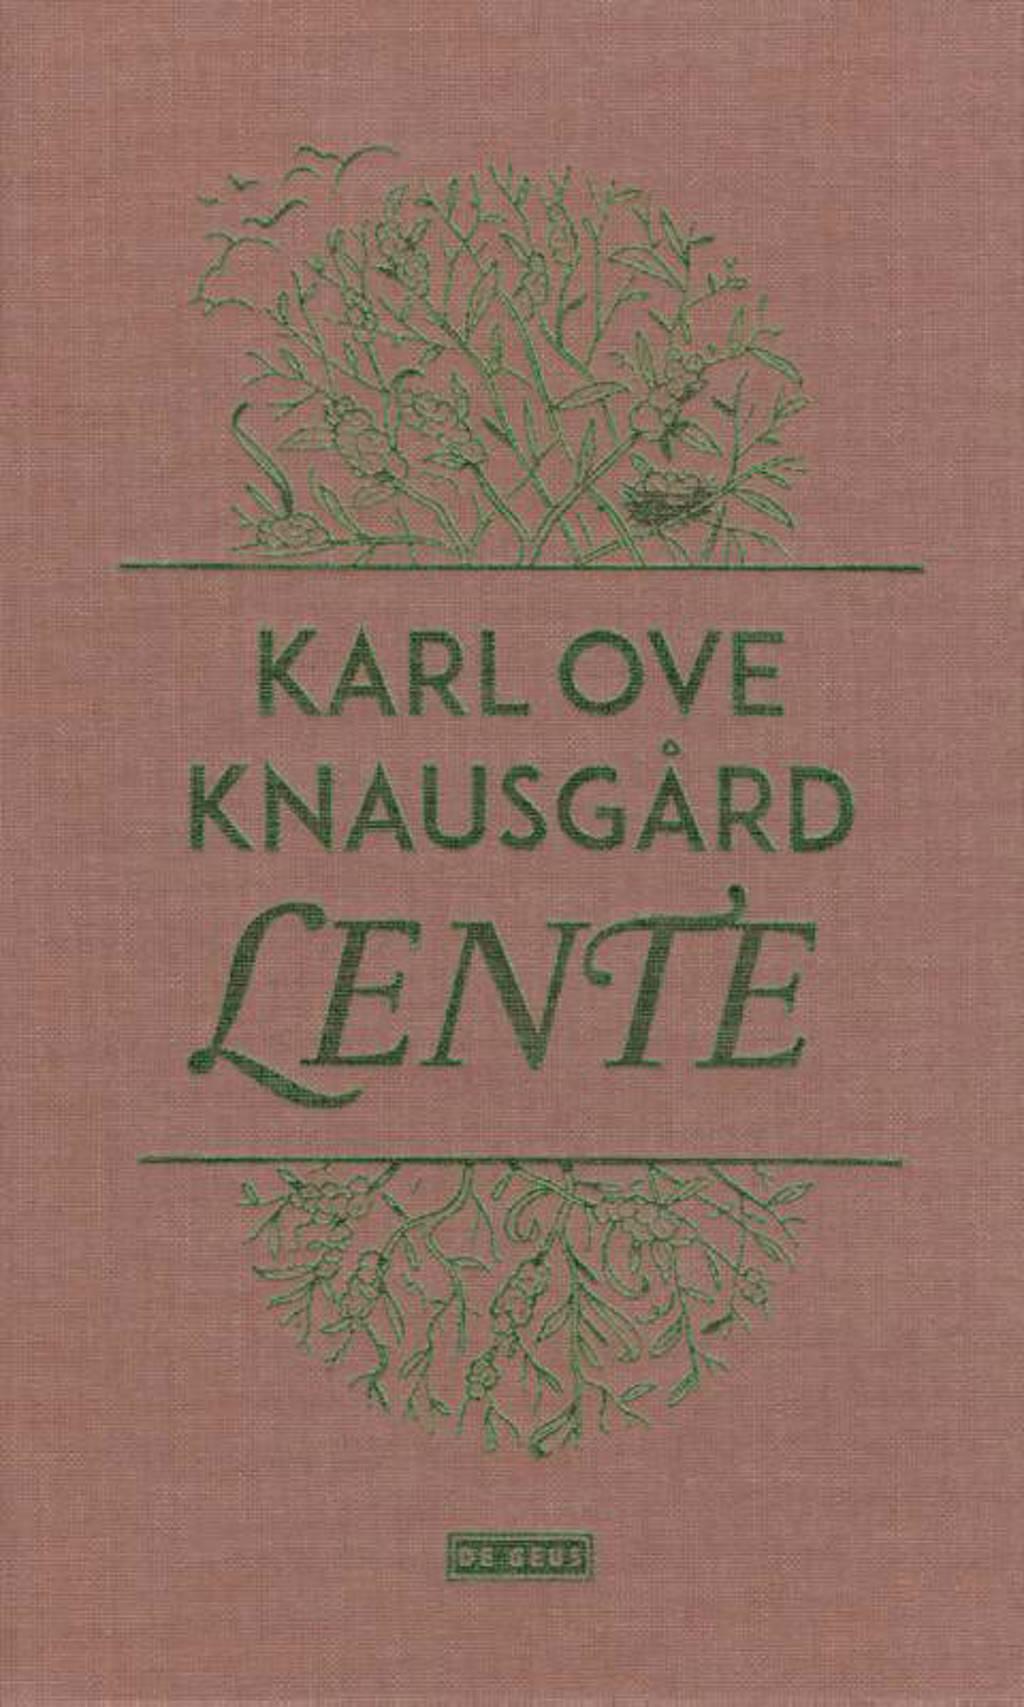 De vier seizoenen: Lente - Karl Ove Knausgård